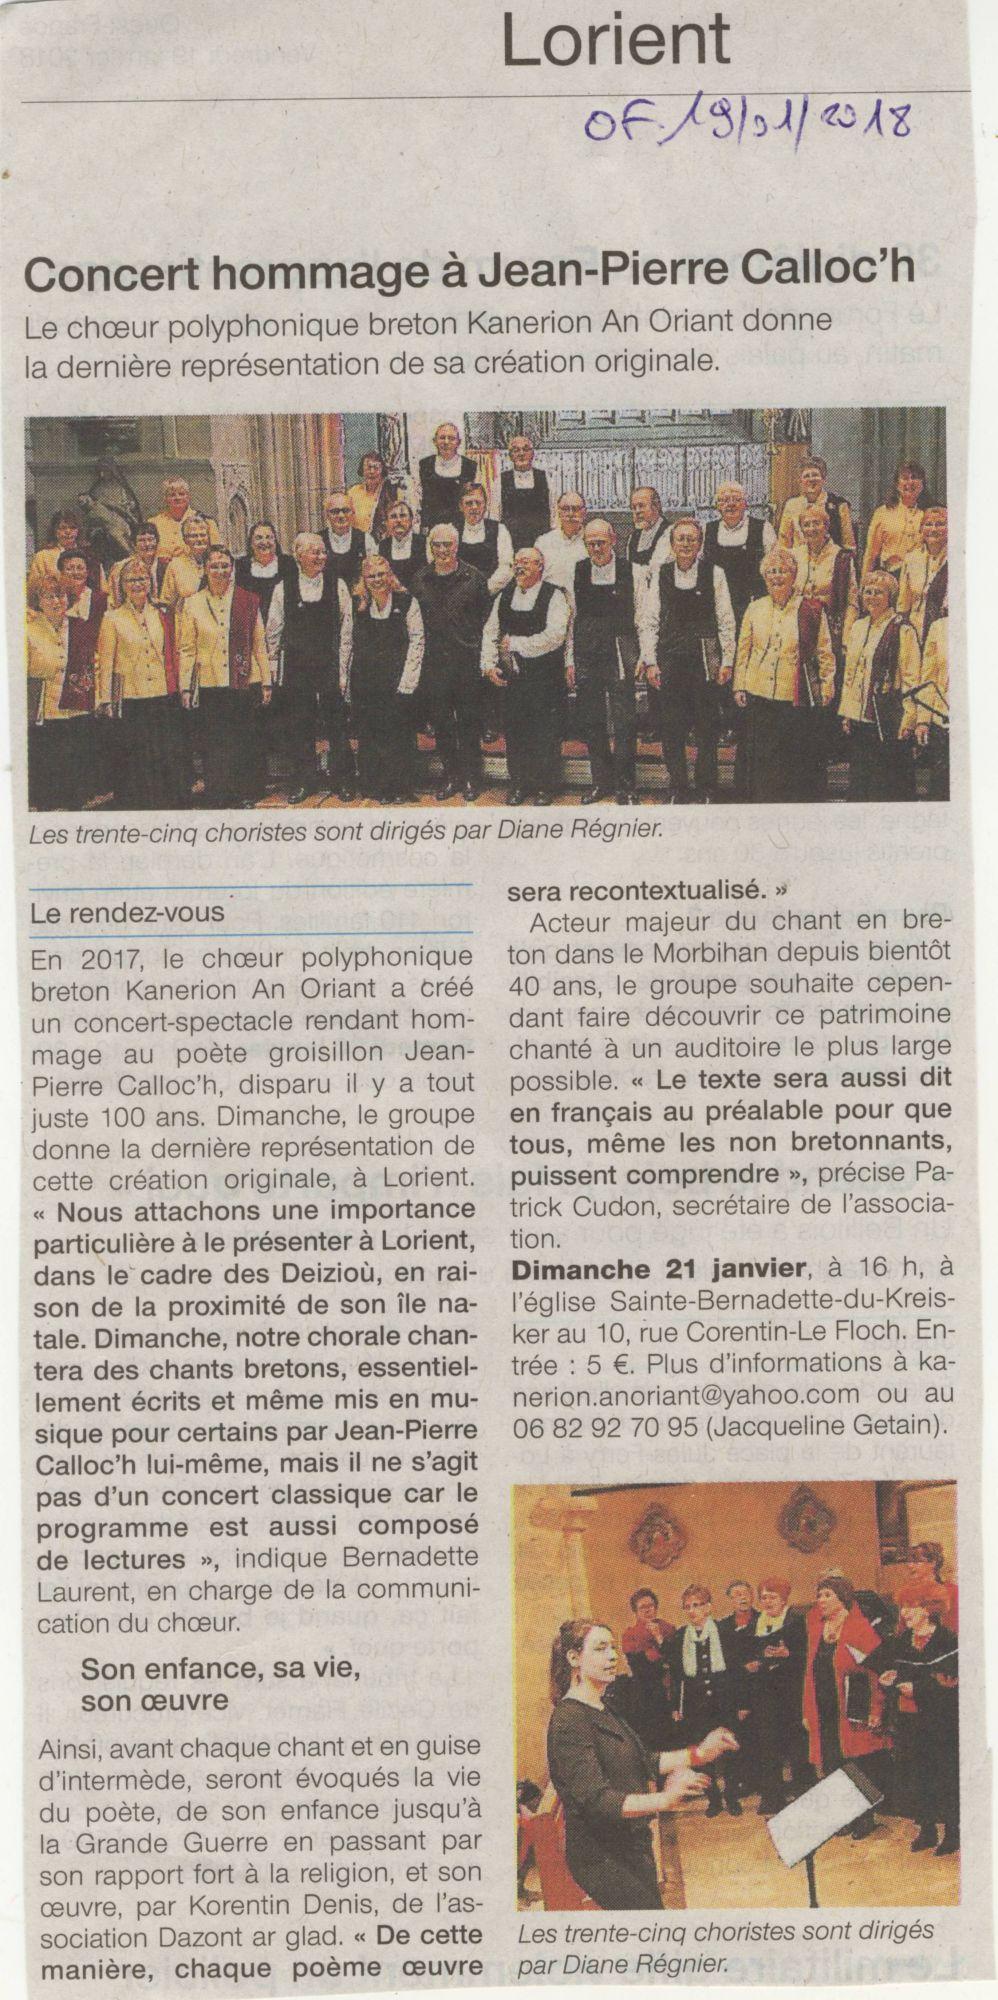 concert-ste-bernadette-lorient-2018-01-19